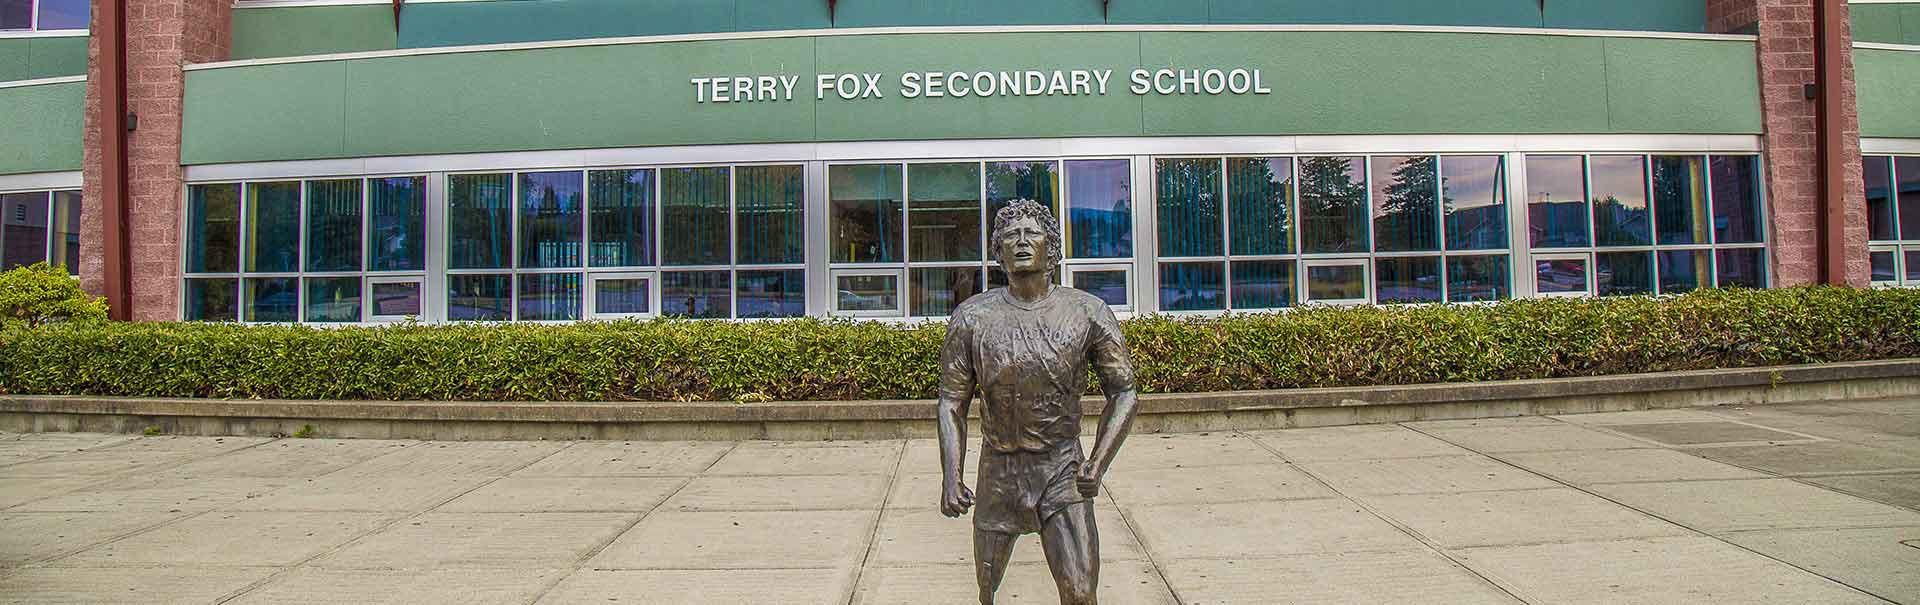 High School in Coquitlam School District in British Columbia, Canada